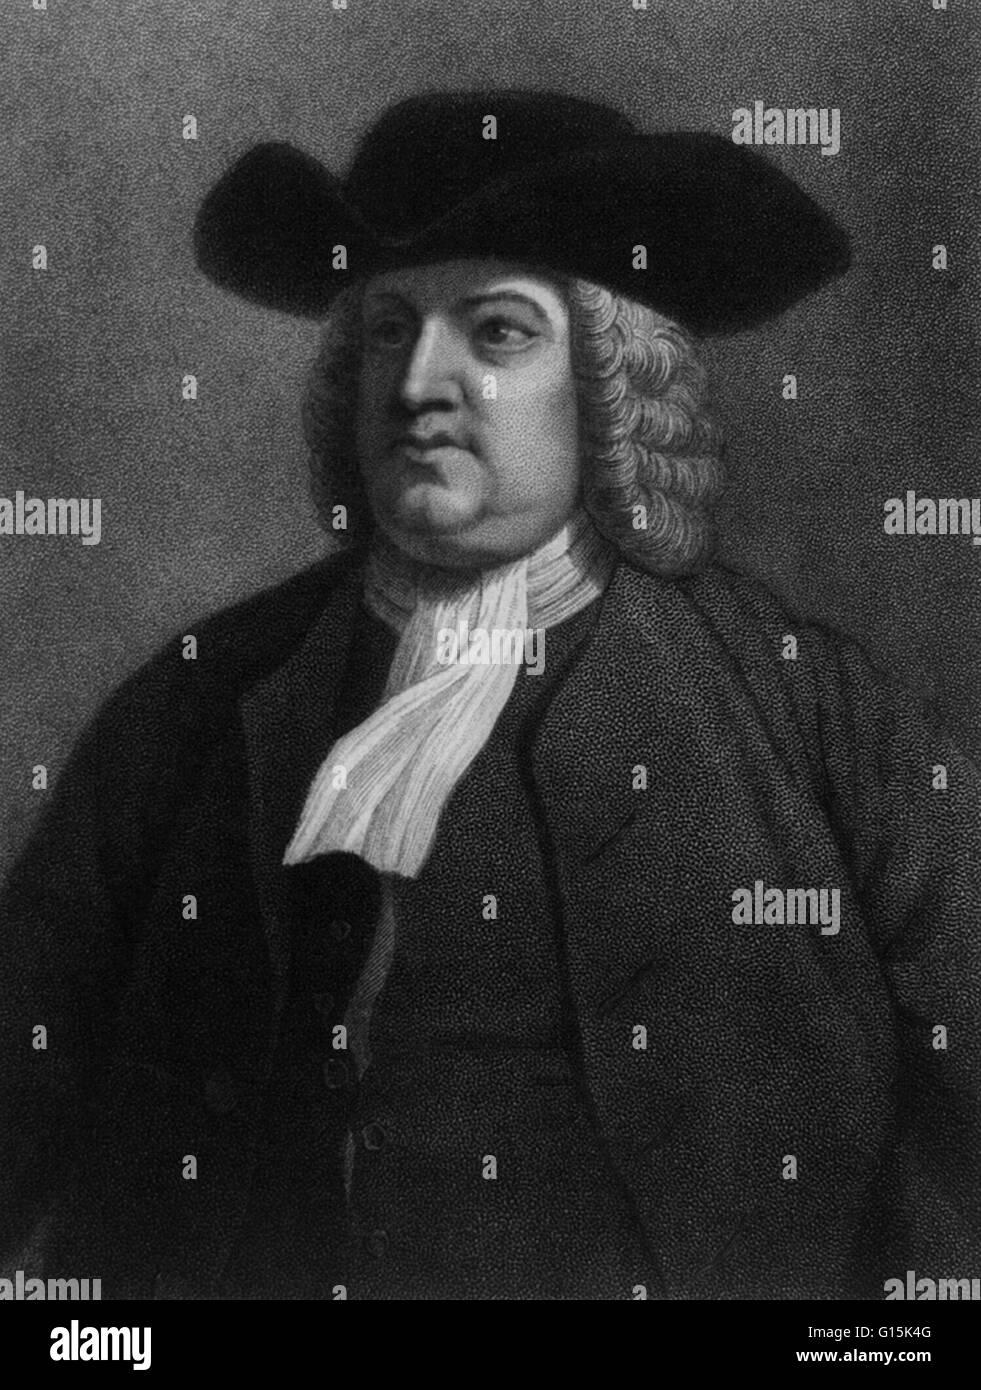 Portrait of William Penn (1644-1718), English real estate entrepreneur, philosopher, and founder of Pennsylvania. Stock Photo